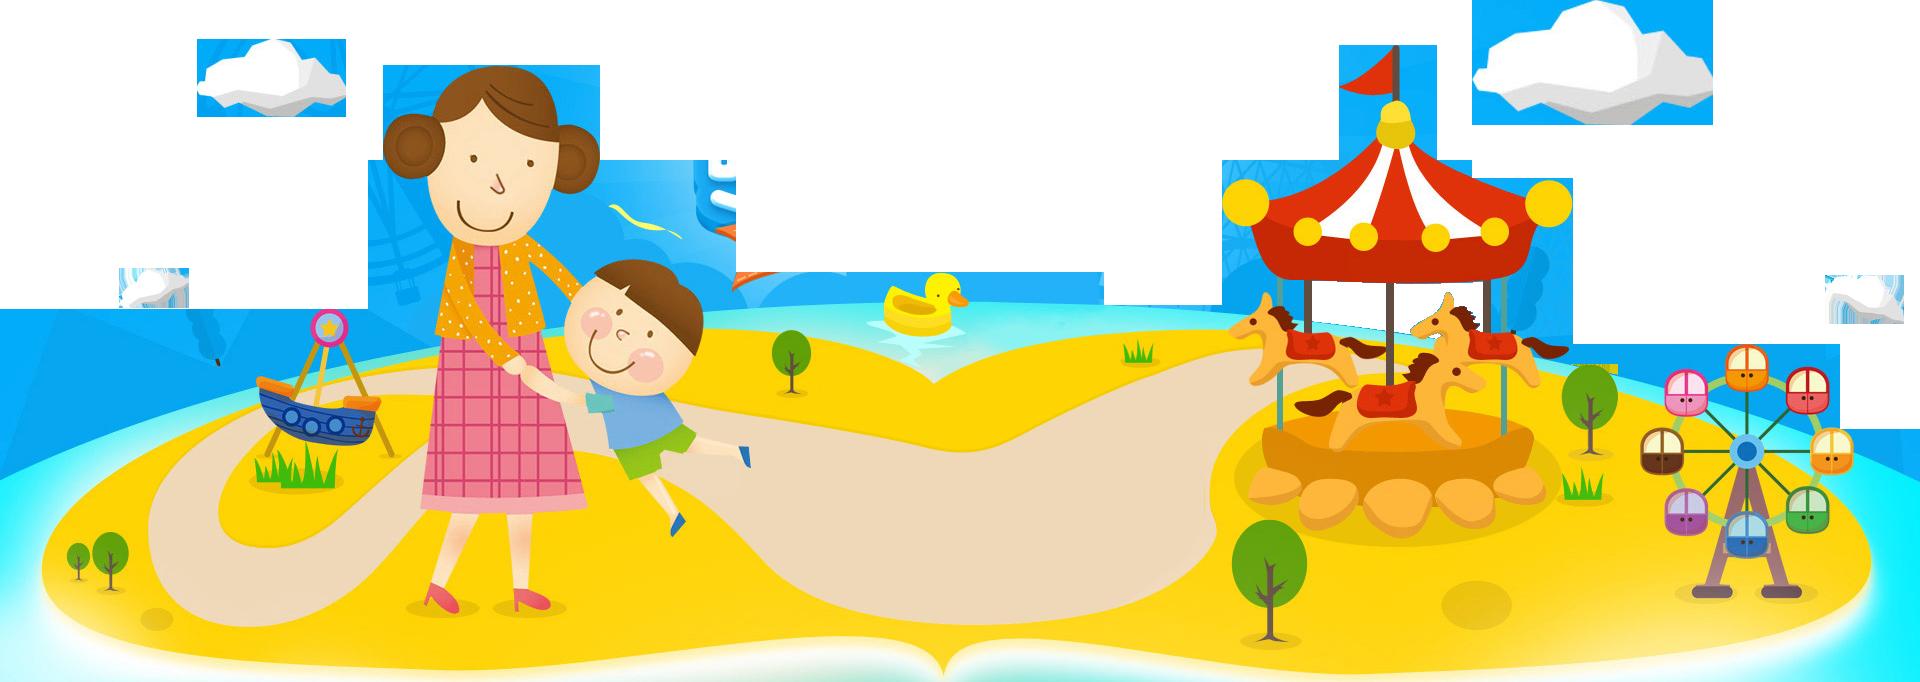 Park clipart simple park. Watercolor painting download carousel